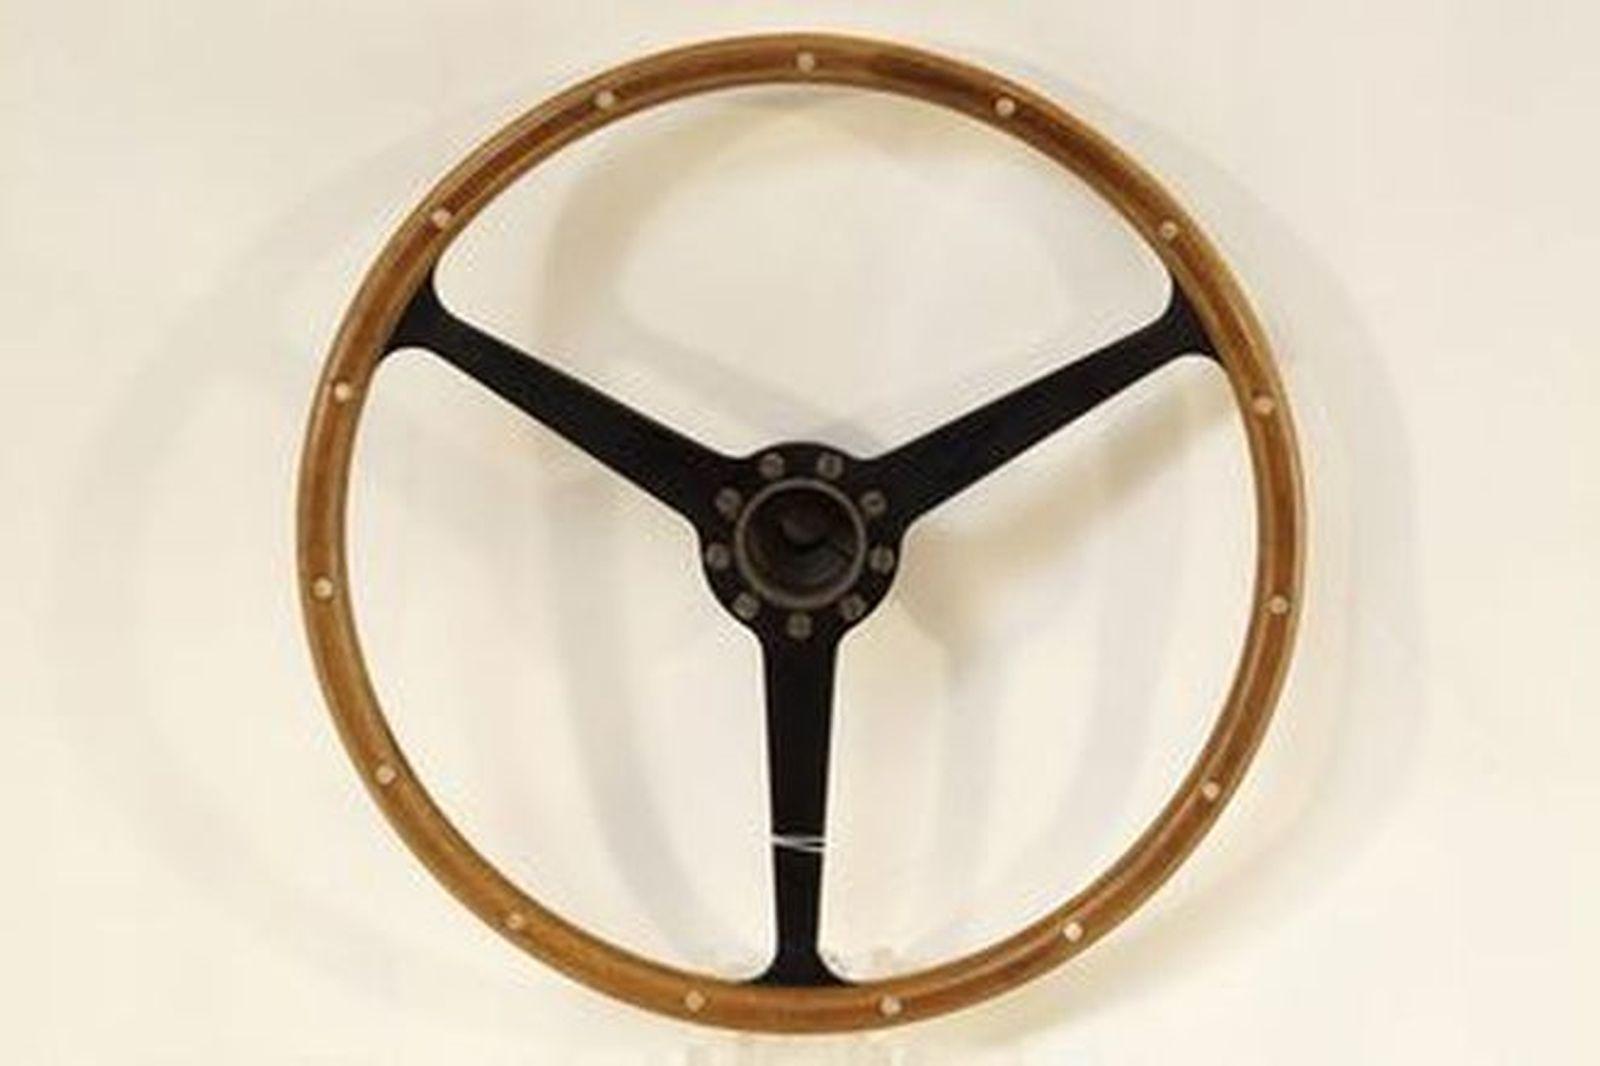 Steering Wheel - early Aston Martin DB 3-spoke wood rim with boss